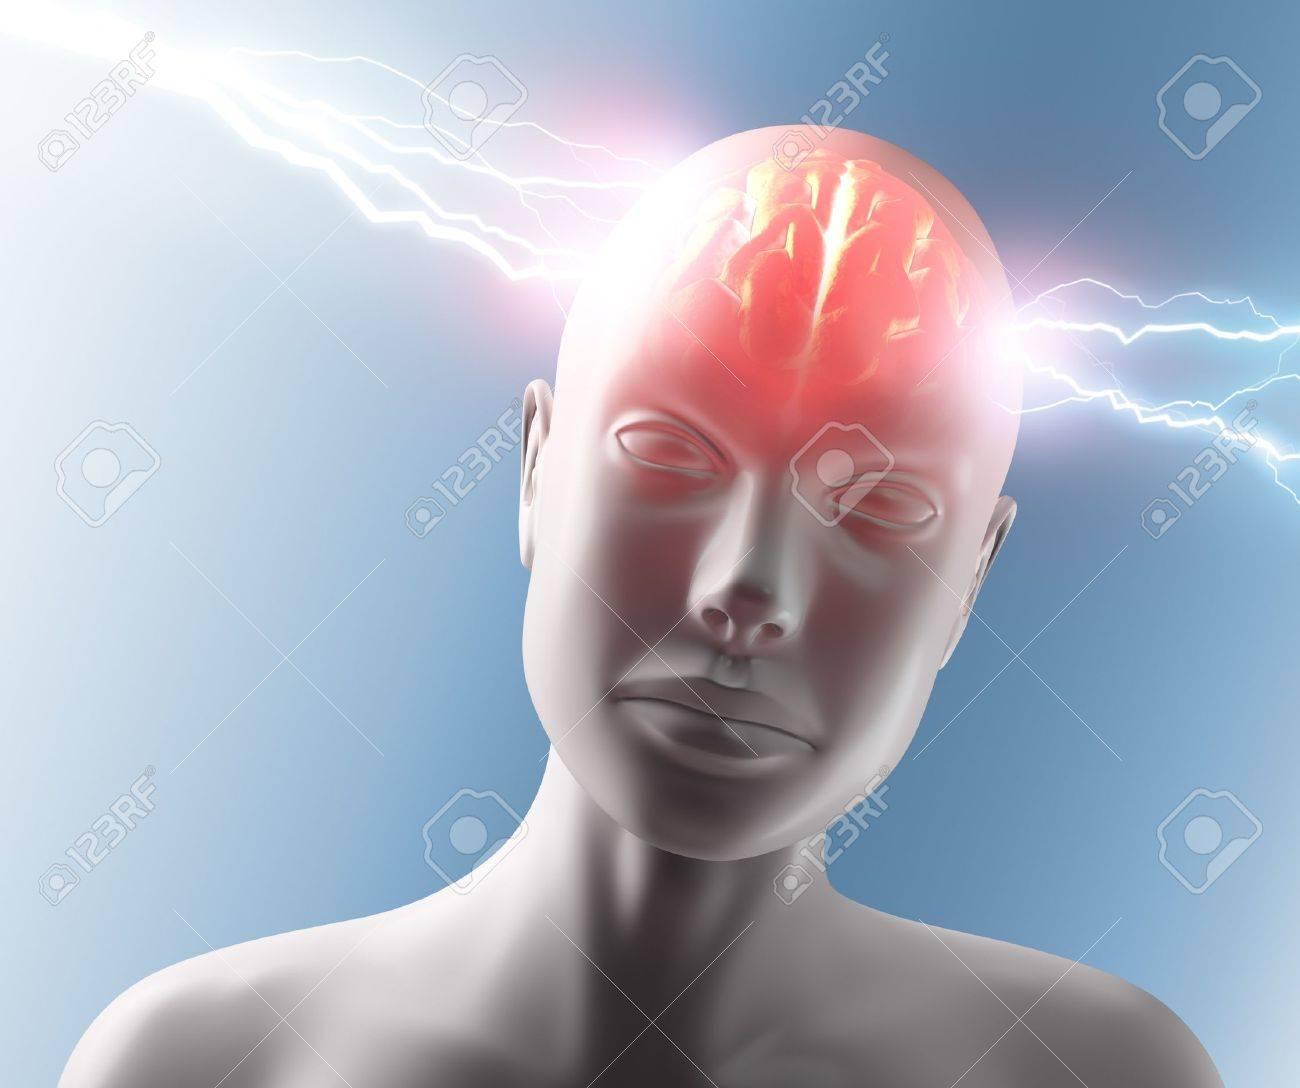 Lightning going through the head and brain. Concept of headache. Stock Photo - 10803479